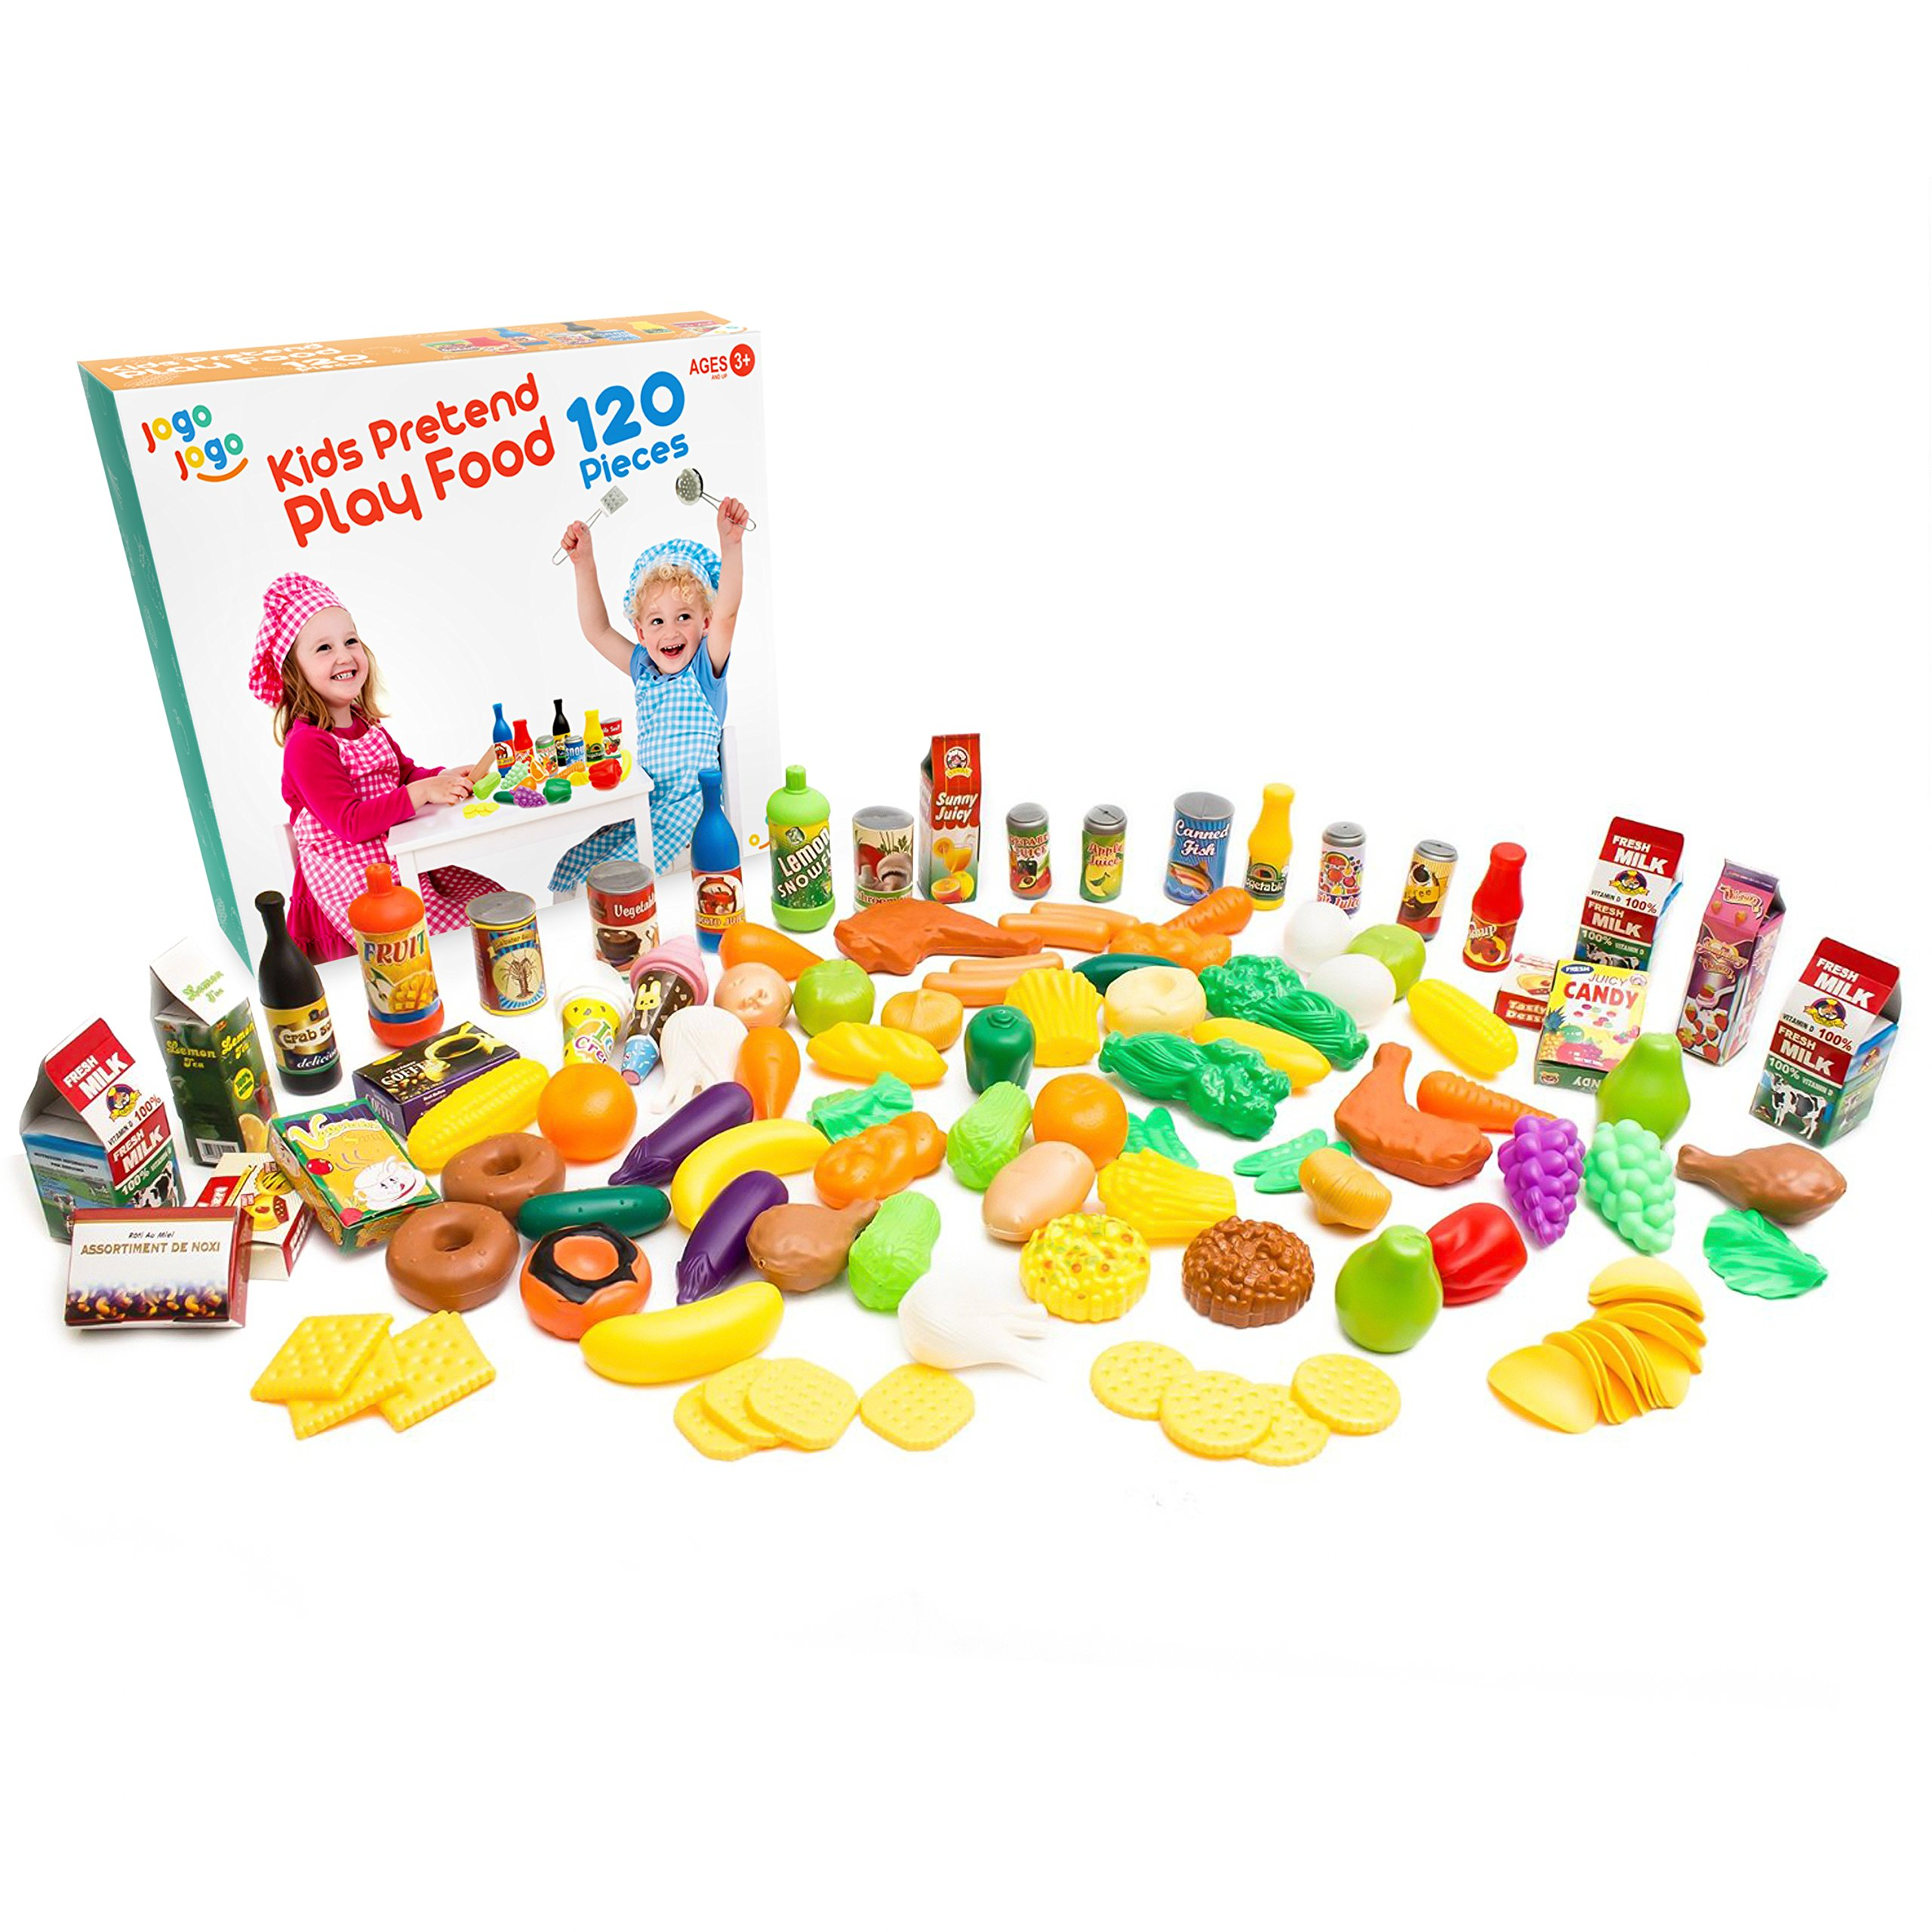 Jogo Jogo Kids Pretend Play Food 120-Piece Set